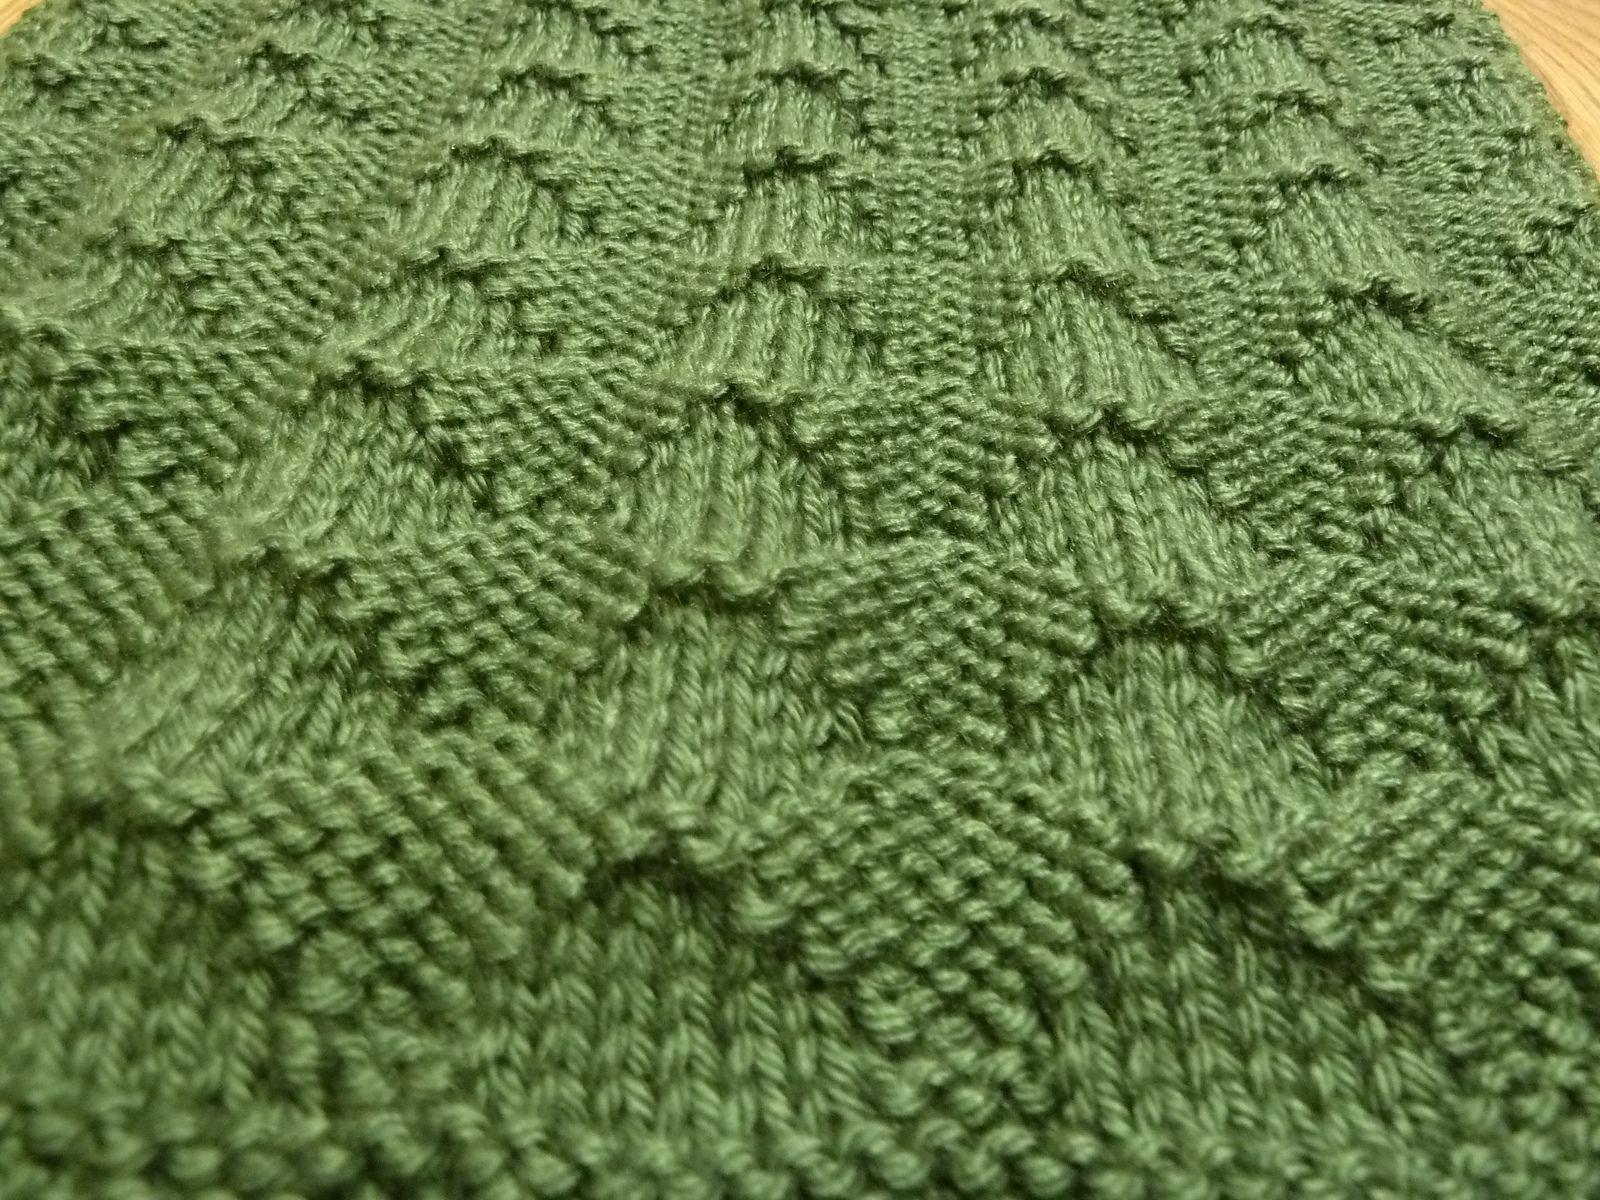 Ravelry june 2013 knit a long 12 block raised diamond pattern ravelry june 2013 knit a long 12 block raised diamond pattern bankloansurffo Choice Image